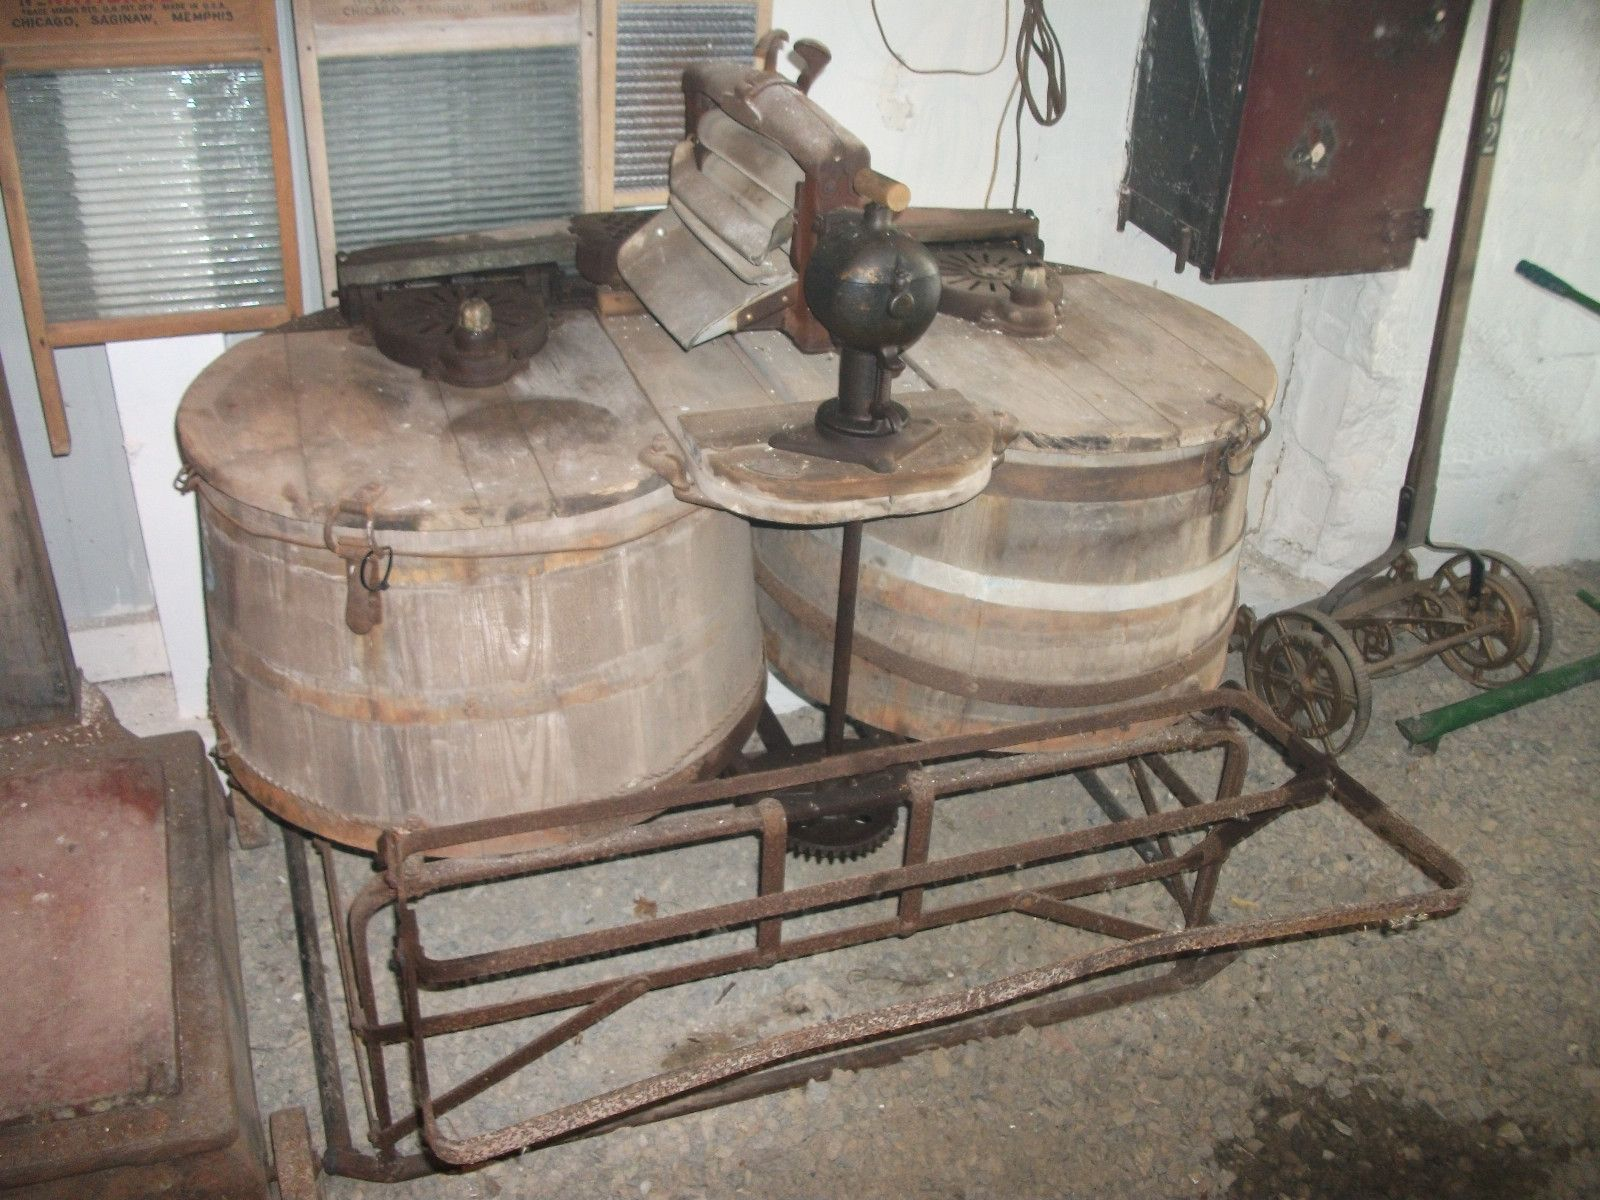 Antique Vintage Dexter Double Twin Wooden Wood Tub Ringer Washer Washing Machine Ebay Wood Tub Antique Washing Machine Vintage Washing Machine